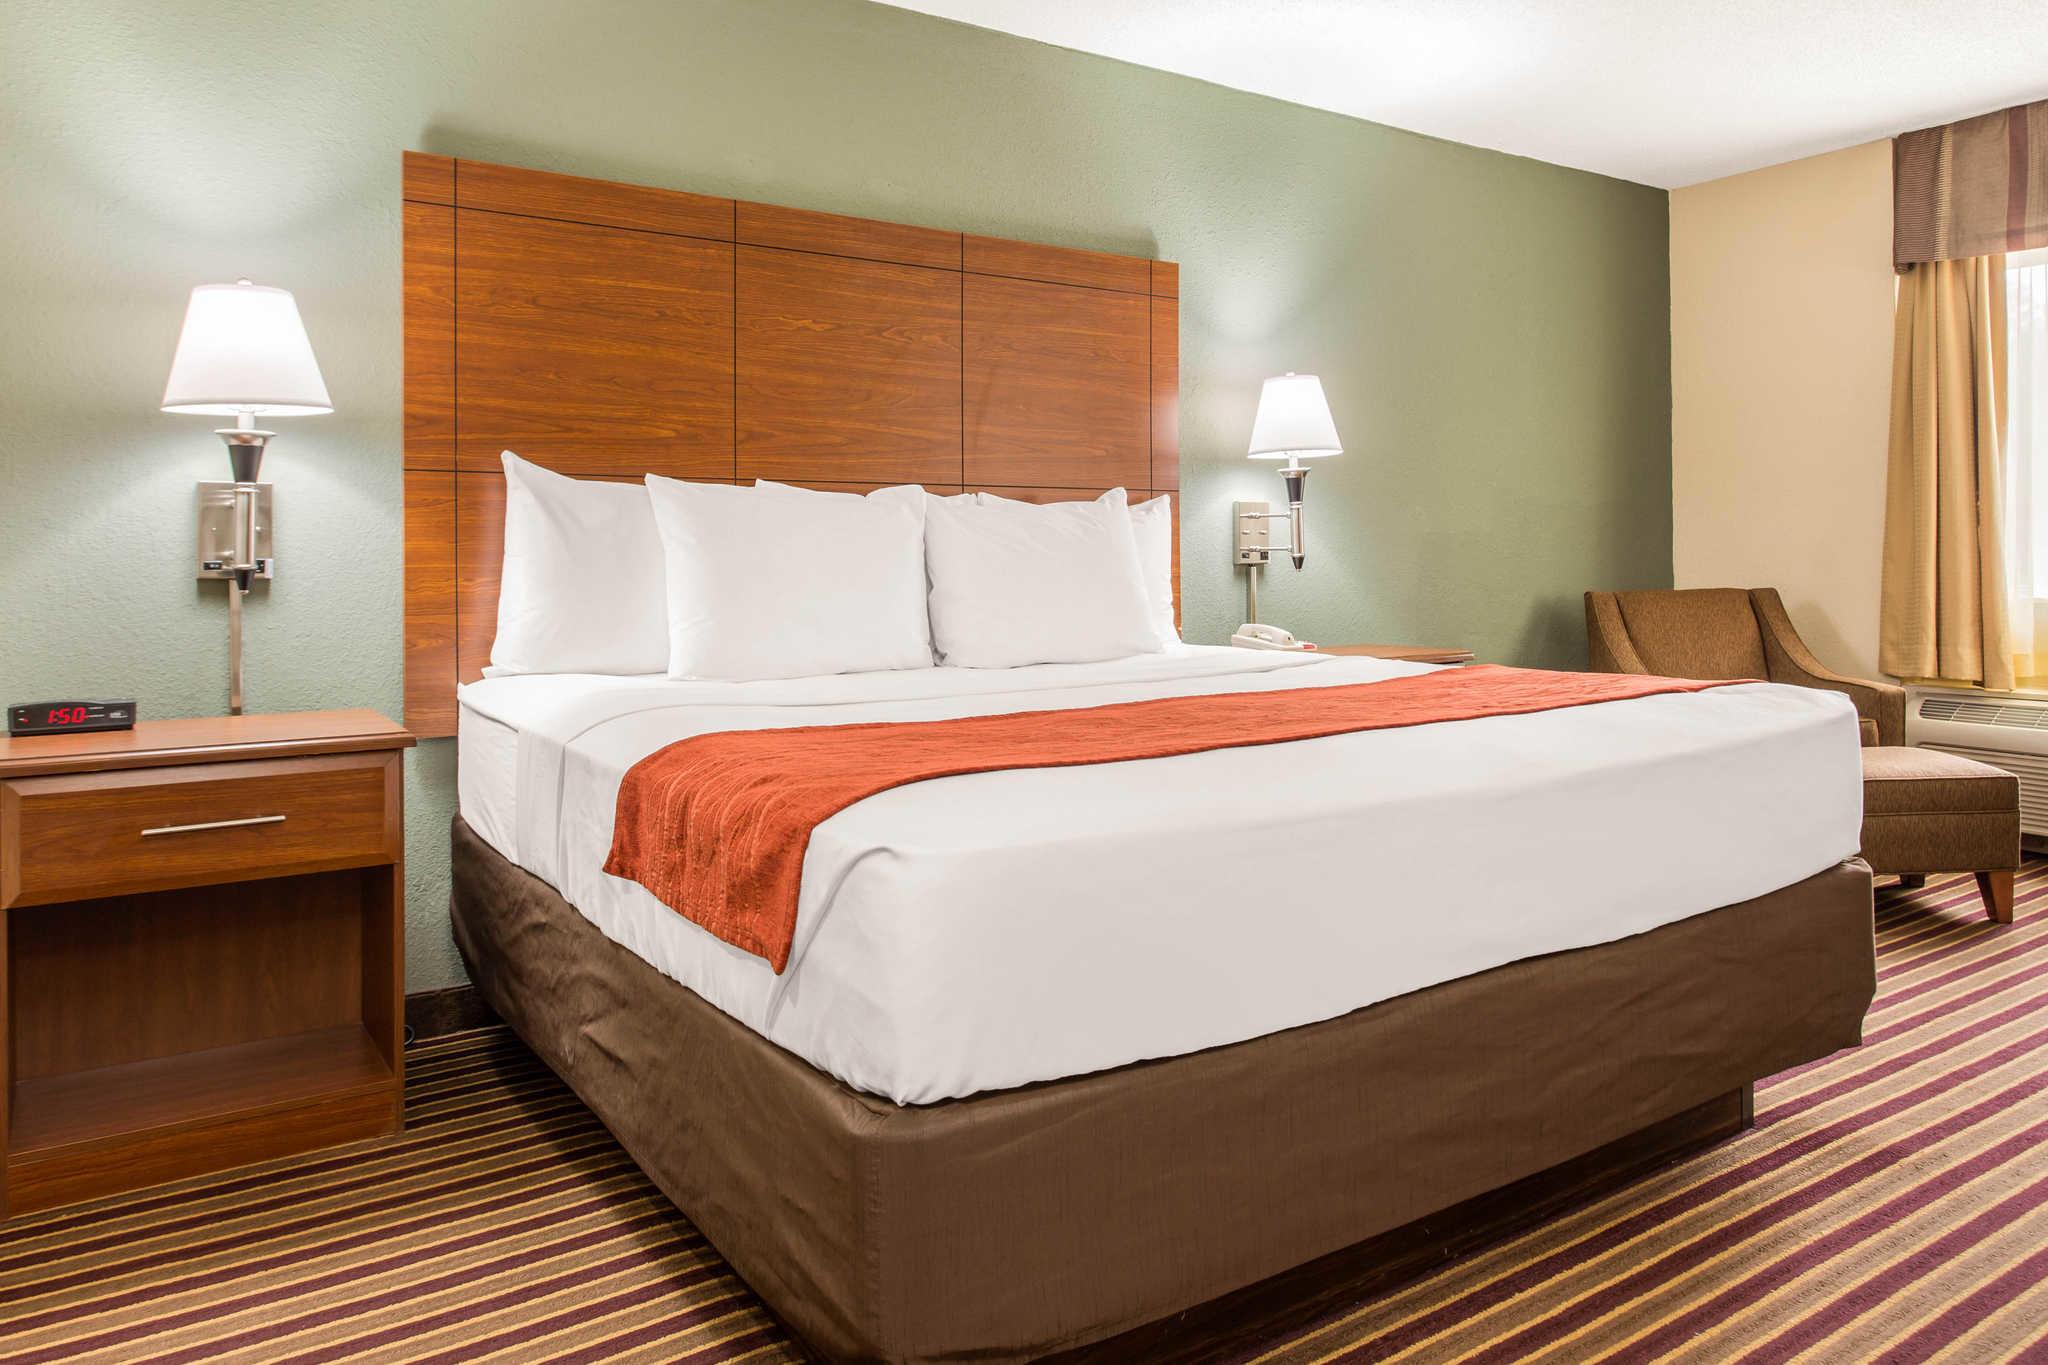 Comfort Inn & Suites Crabtree Valley image 15